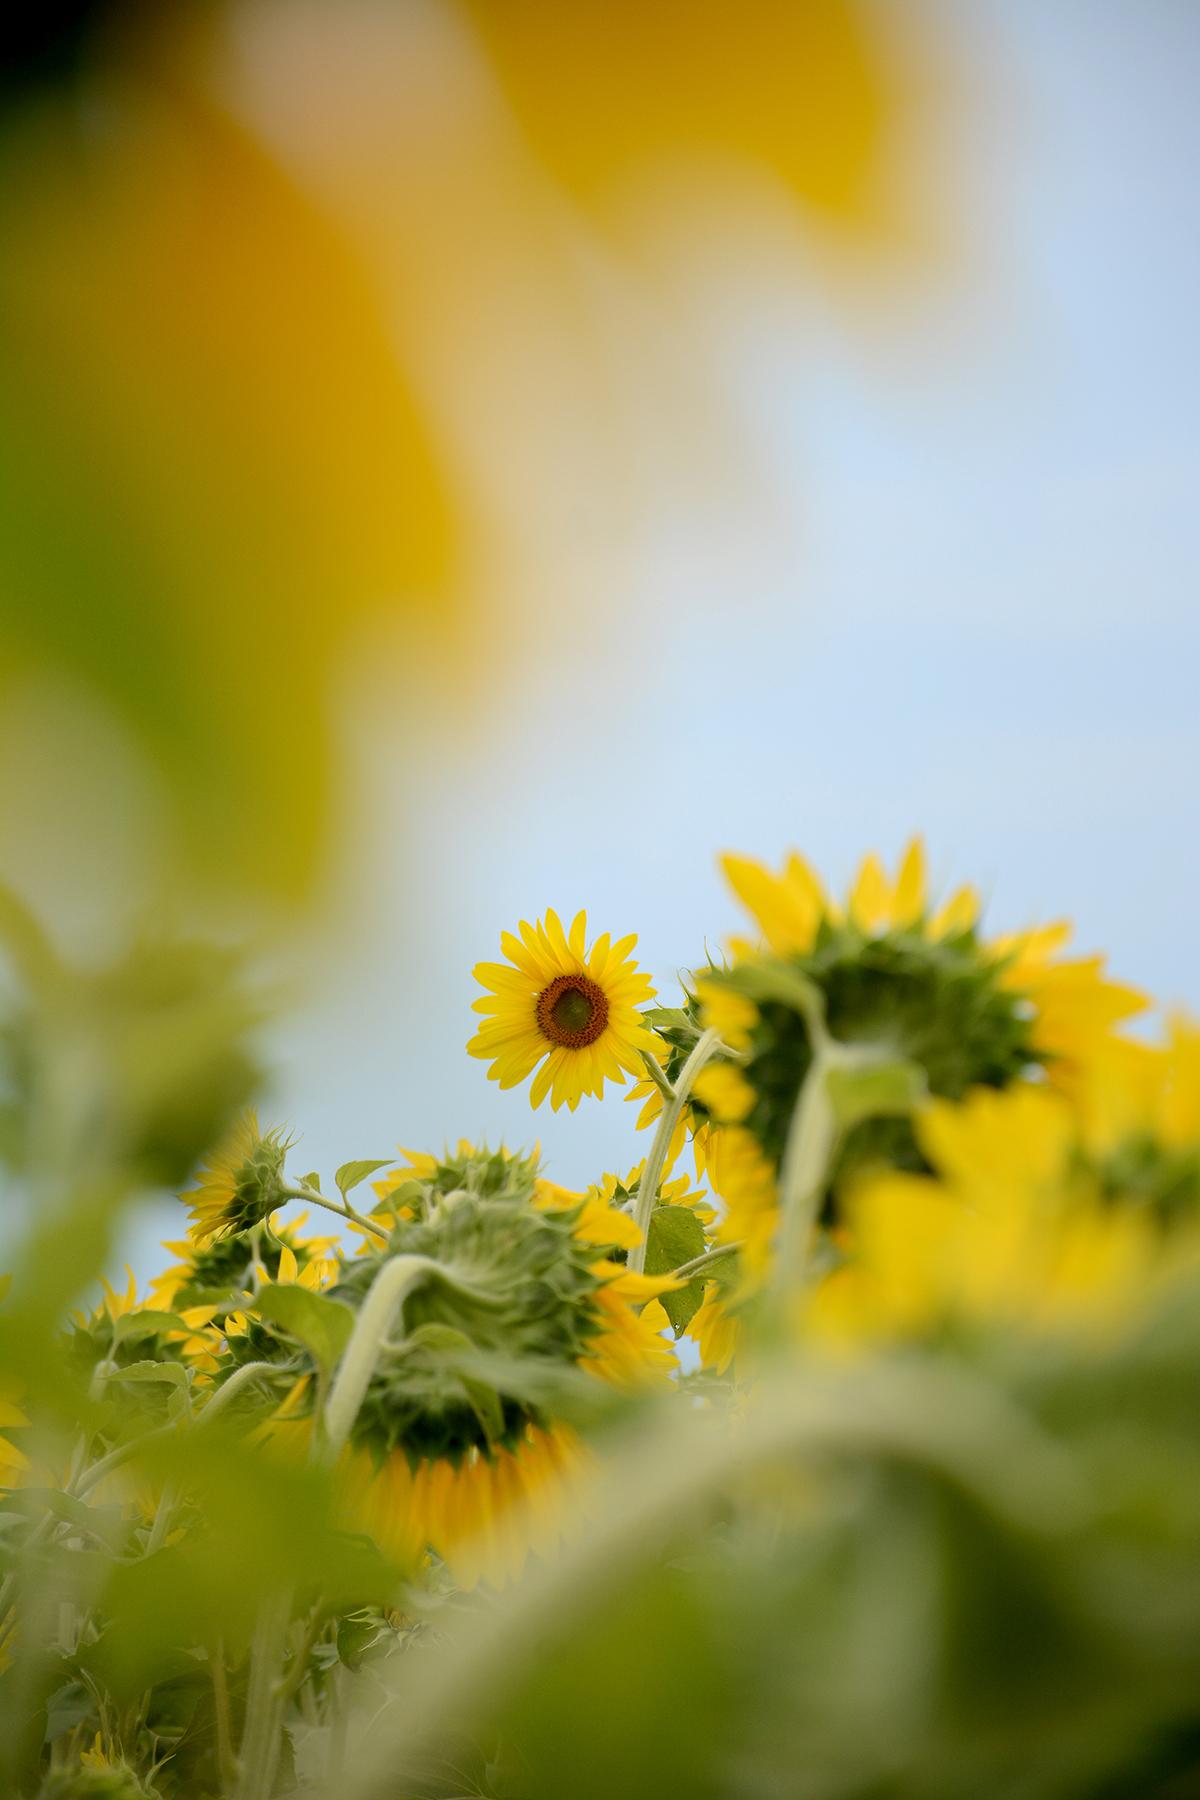 2015-08-07_Sunflower1